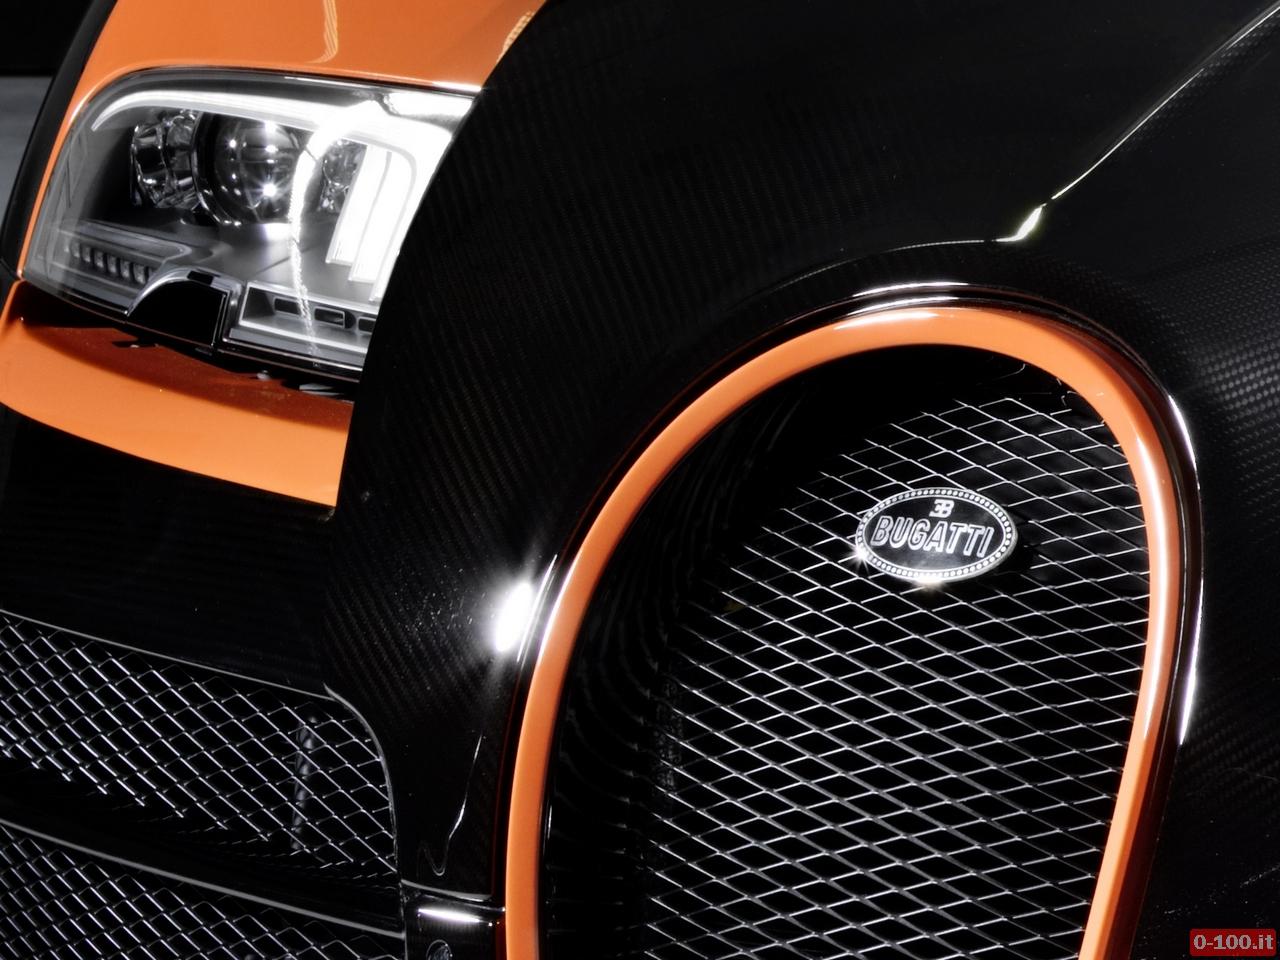 bugatti-veyron-16-4-grand-sport-vitesse-debutto-a-shanghai_0-100_14